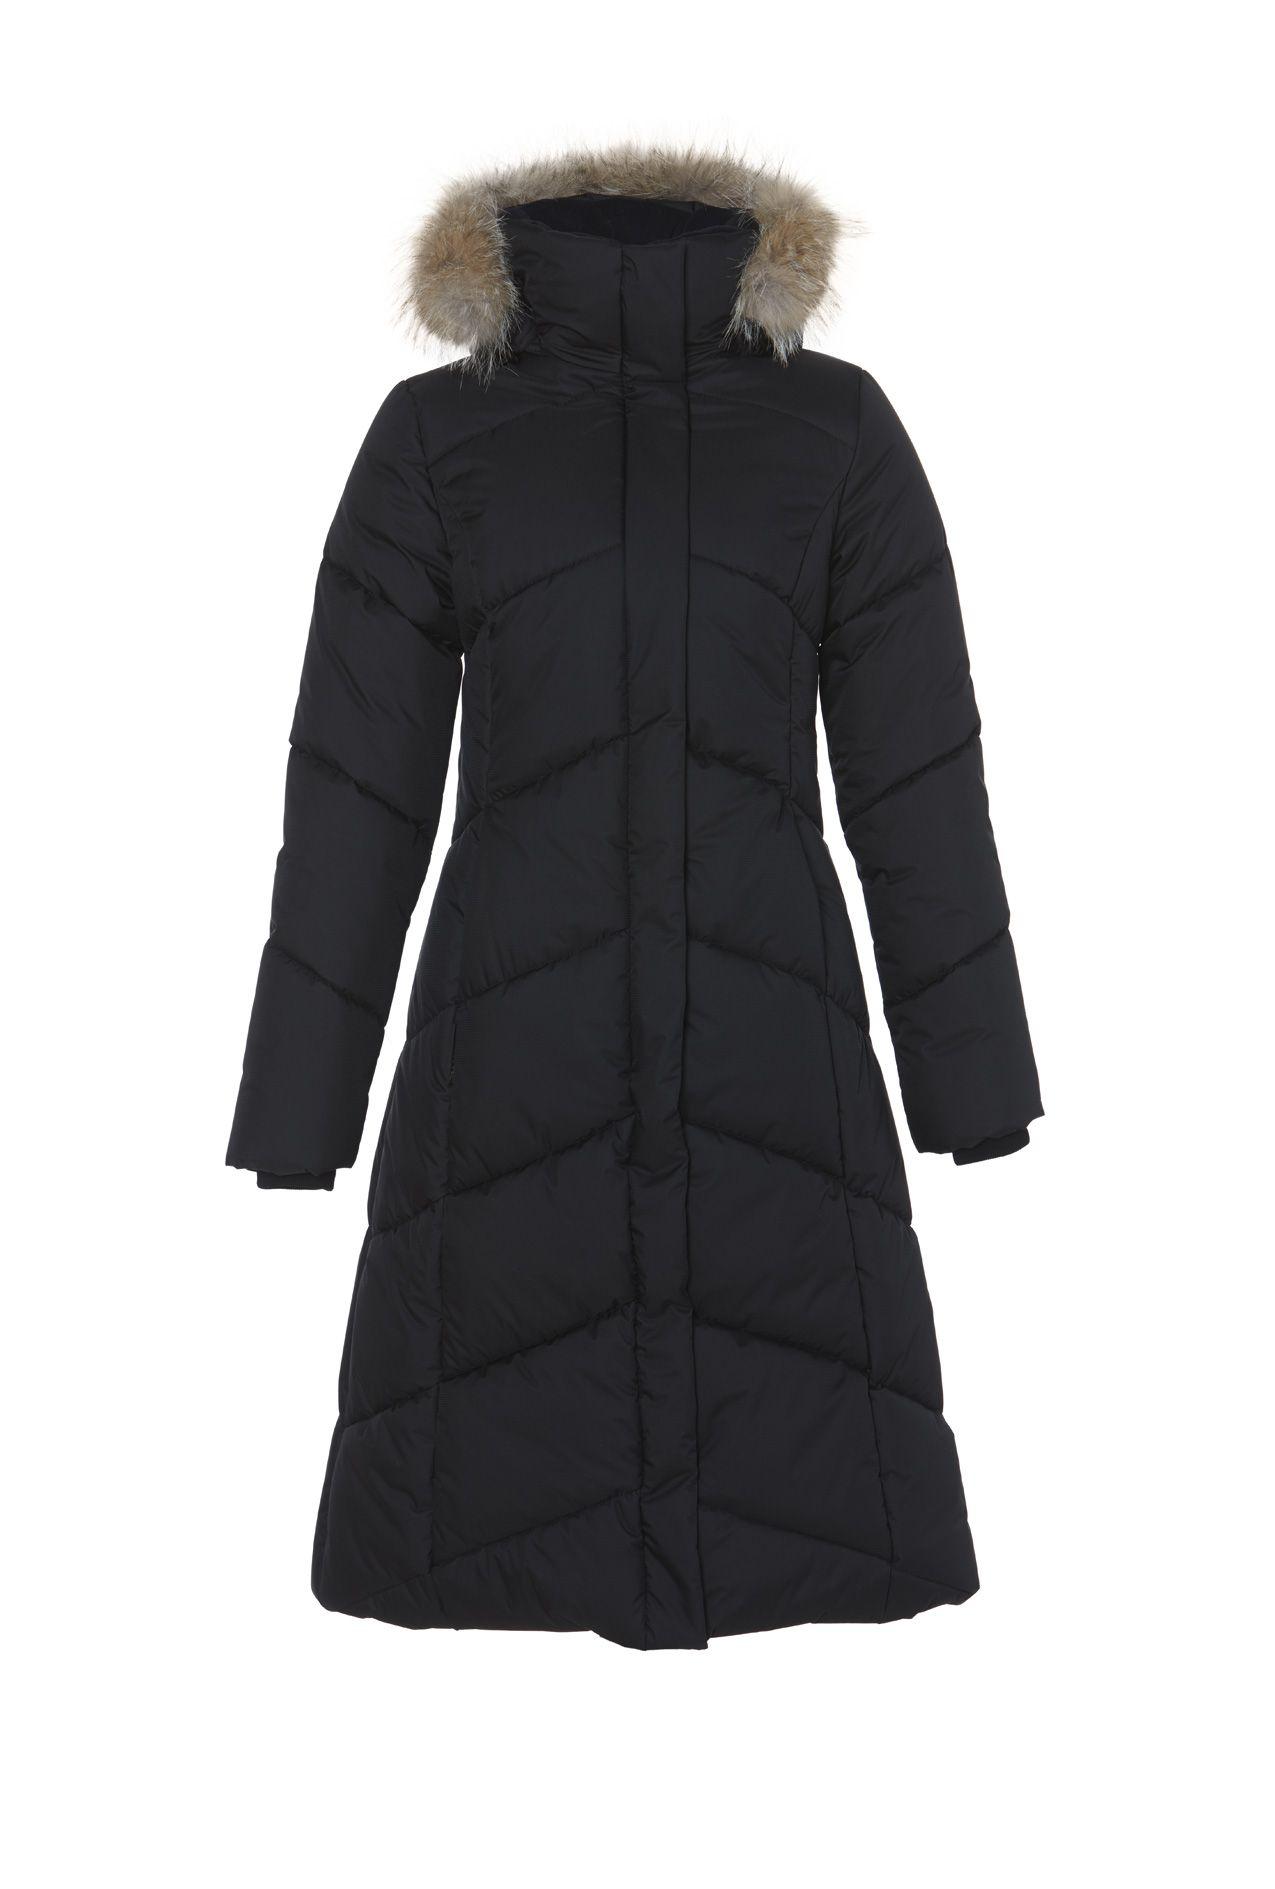 manteaux chauds femmes kanuk mode manteau manteau. Black Bedroom Furniture Sets. Home Design Ideas